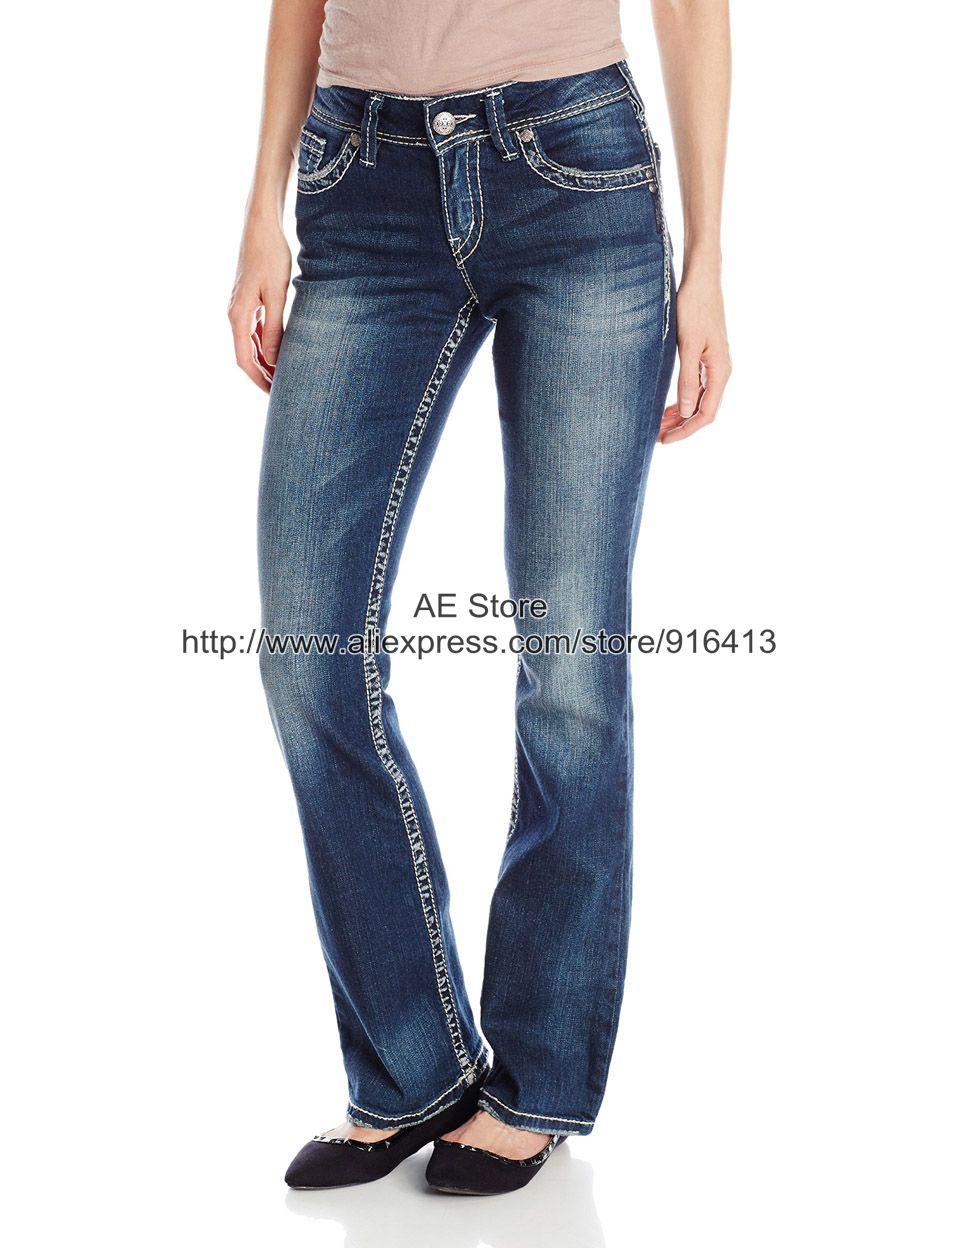 Dark Blue Bootcut Jeans Promotion-Shop for Promotional Dark Blue ...